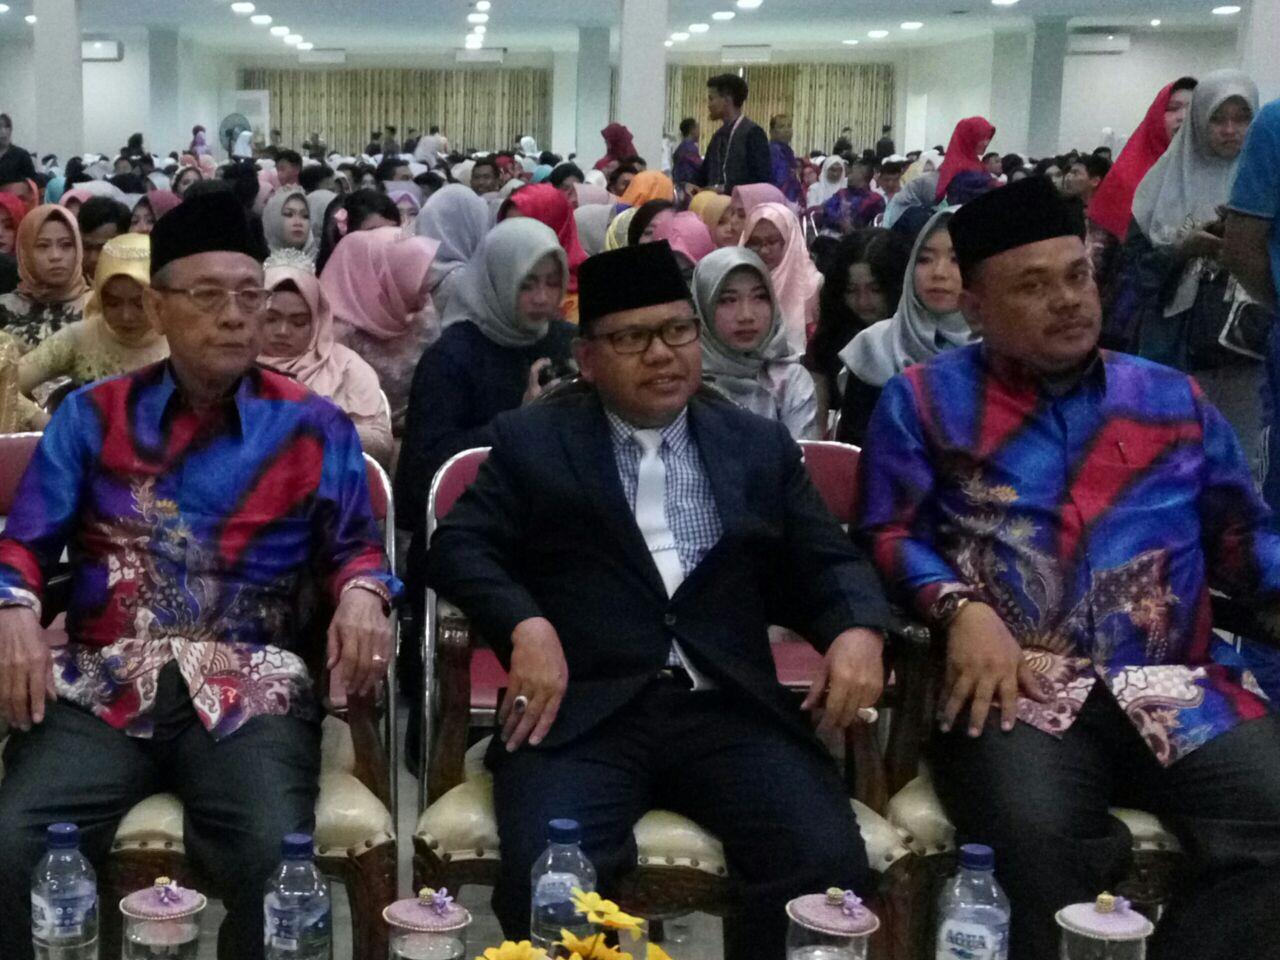 Lulusan SMA/SMK di Lampung Menjadi Evaluasi Disdikbud Lampung